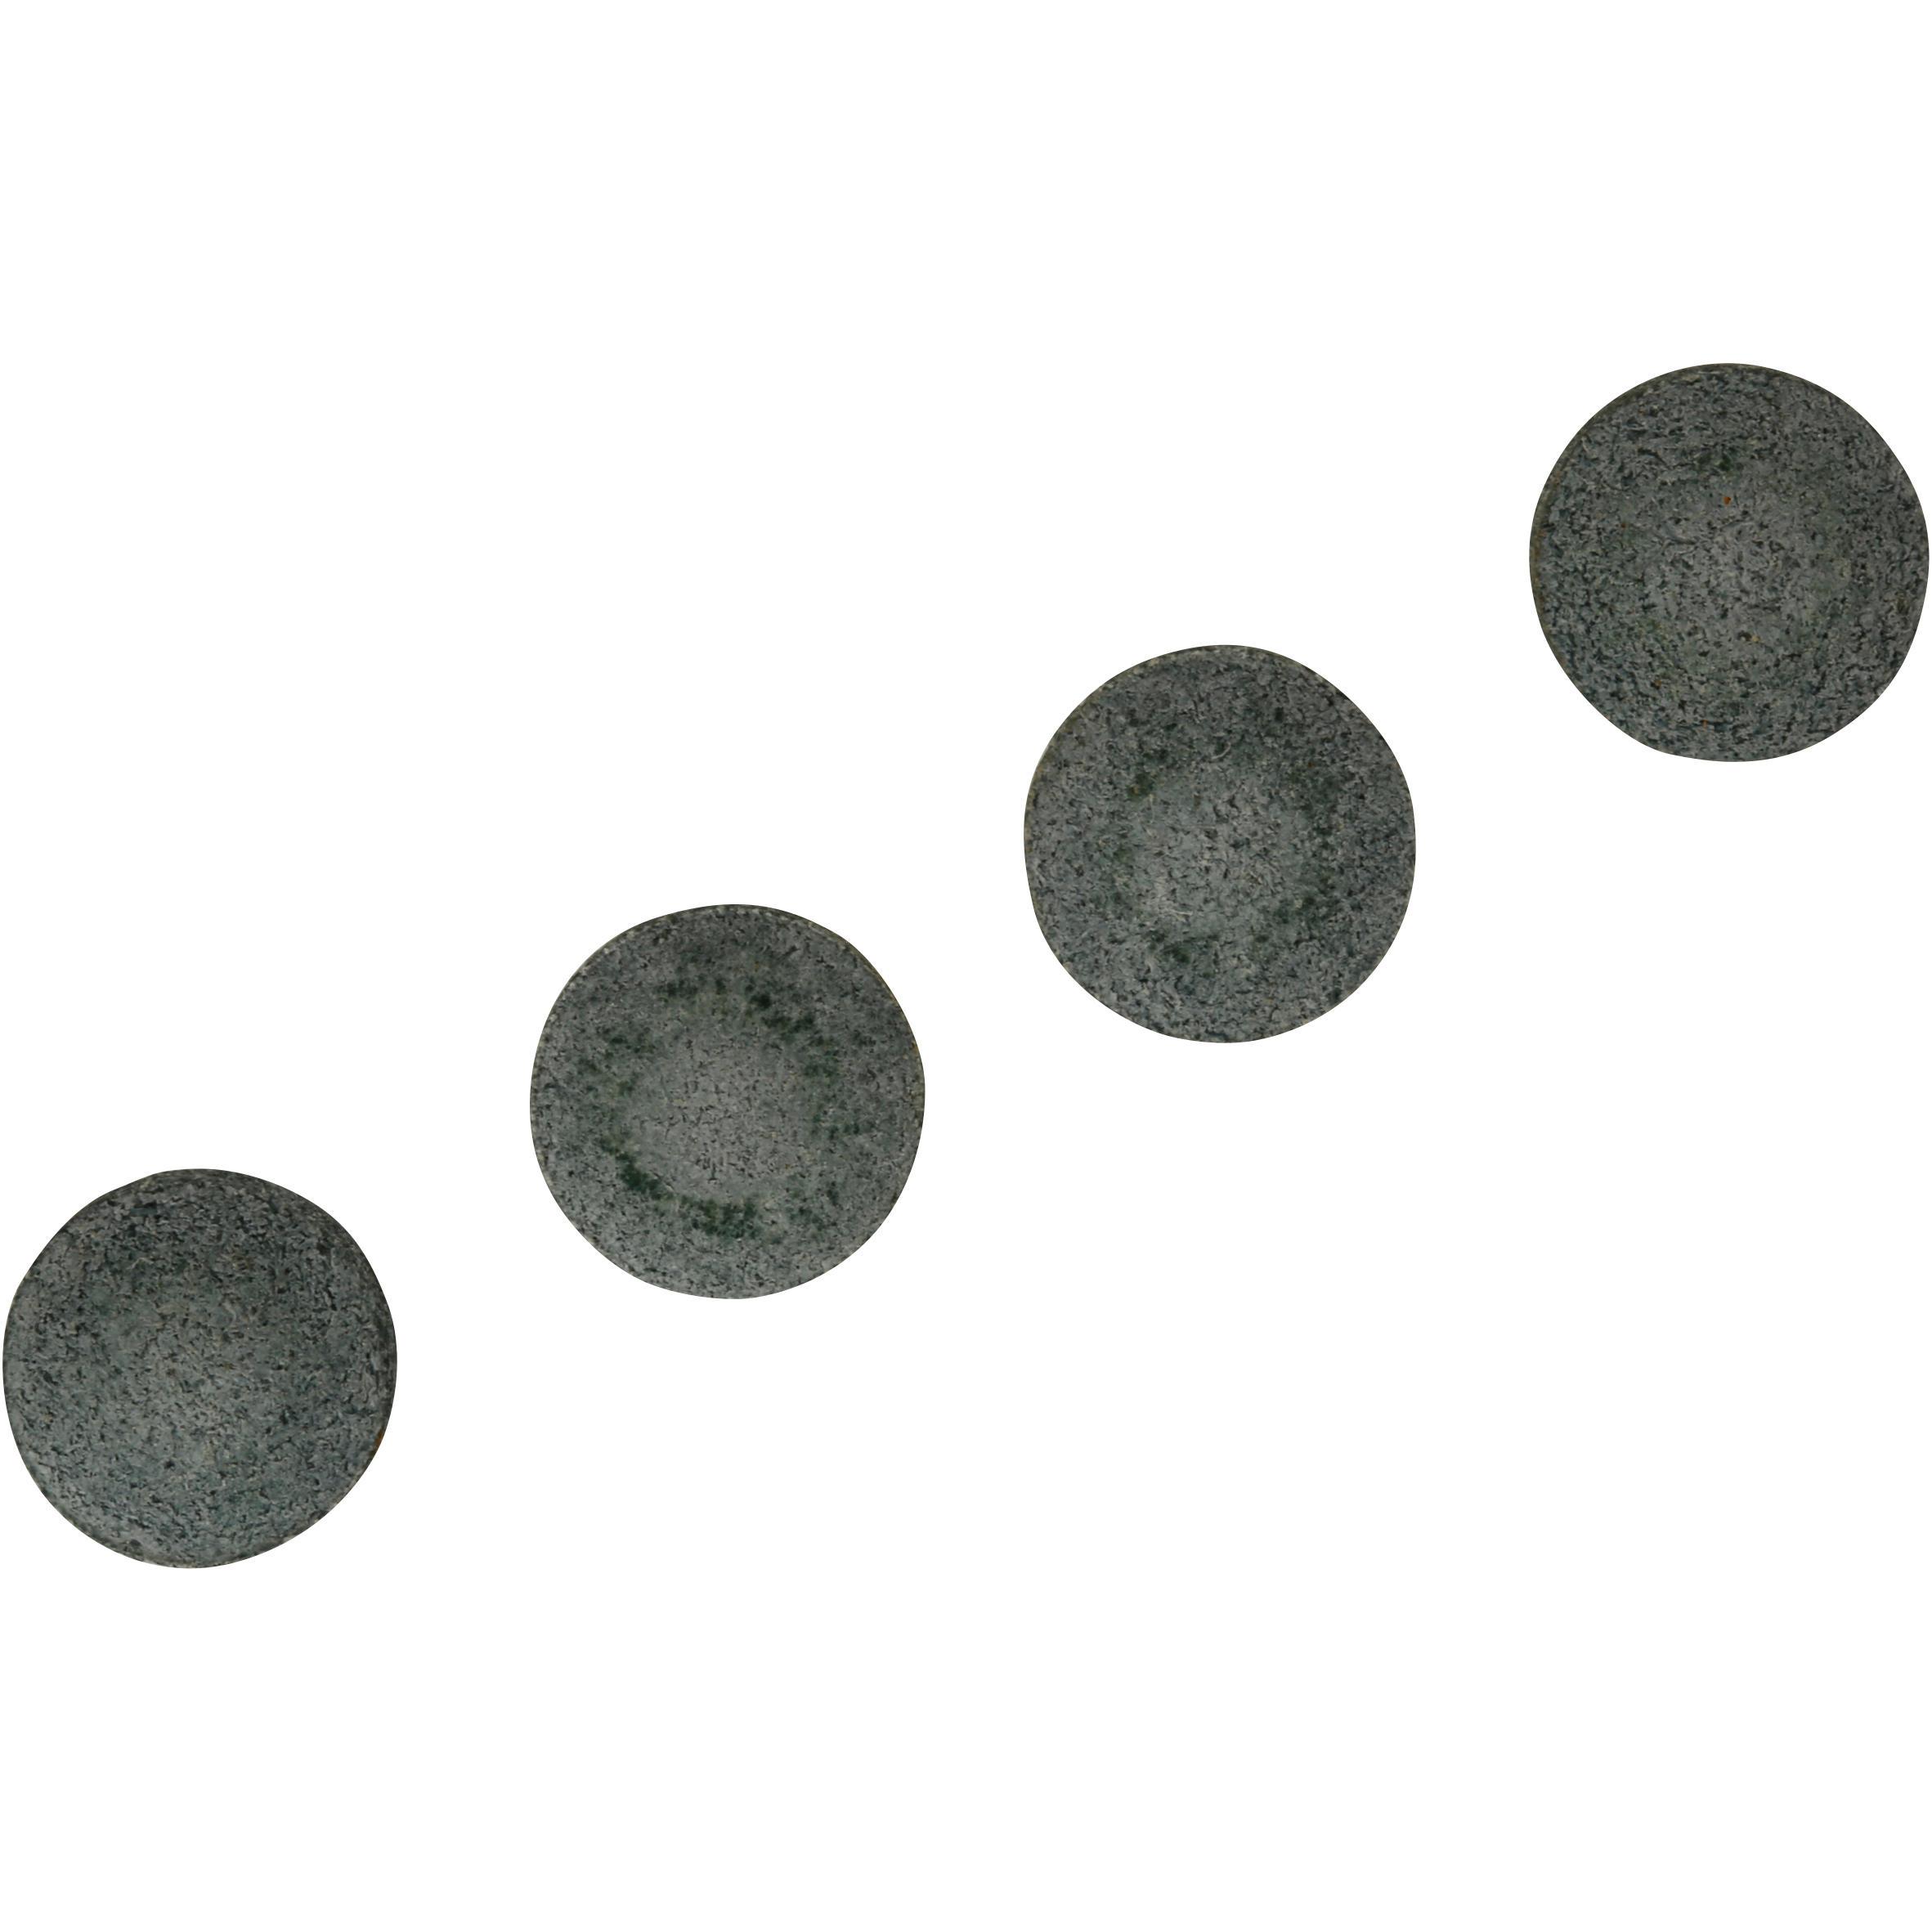 Pool Cue Tips 13 mm - 4-Pack